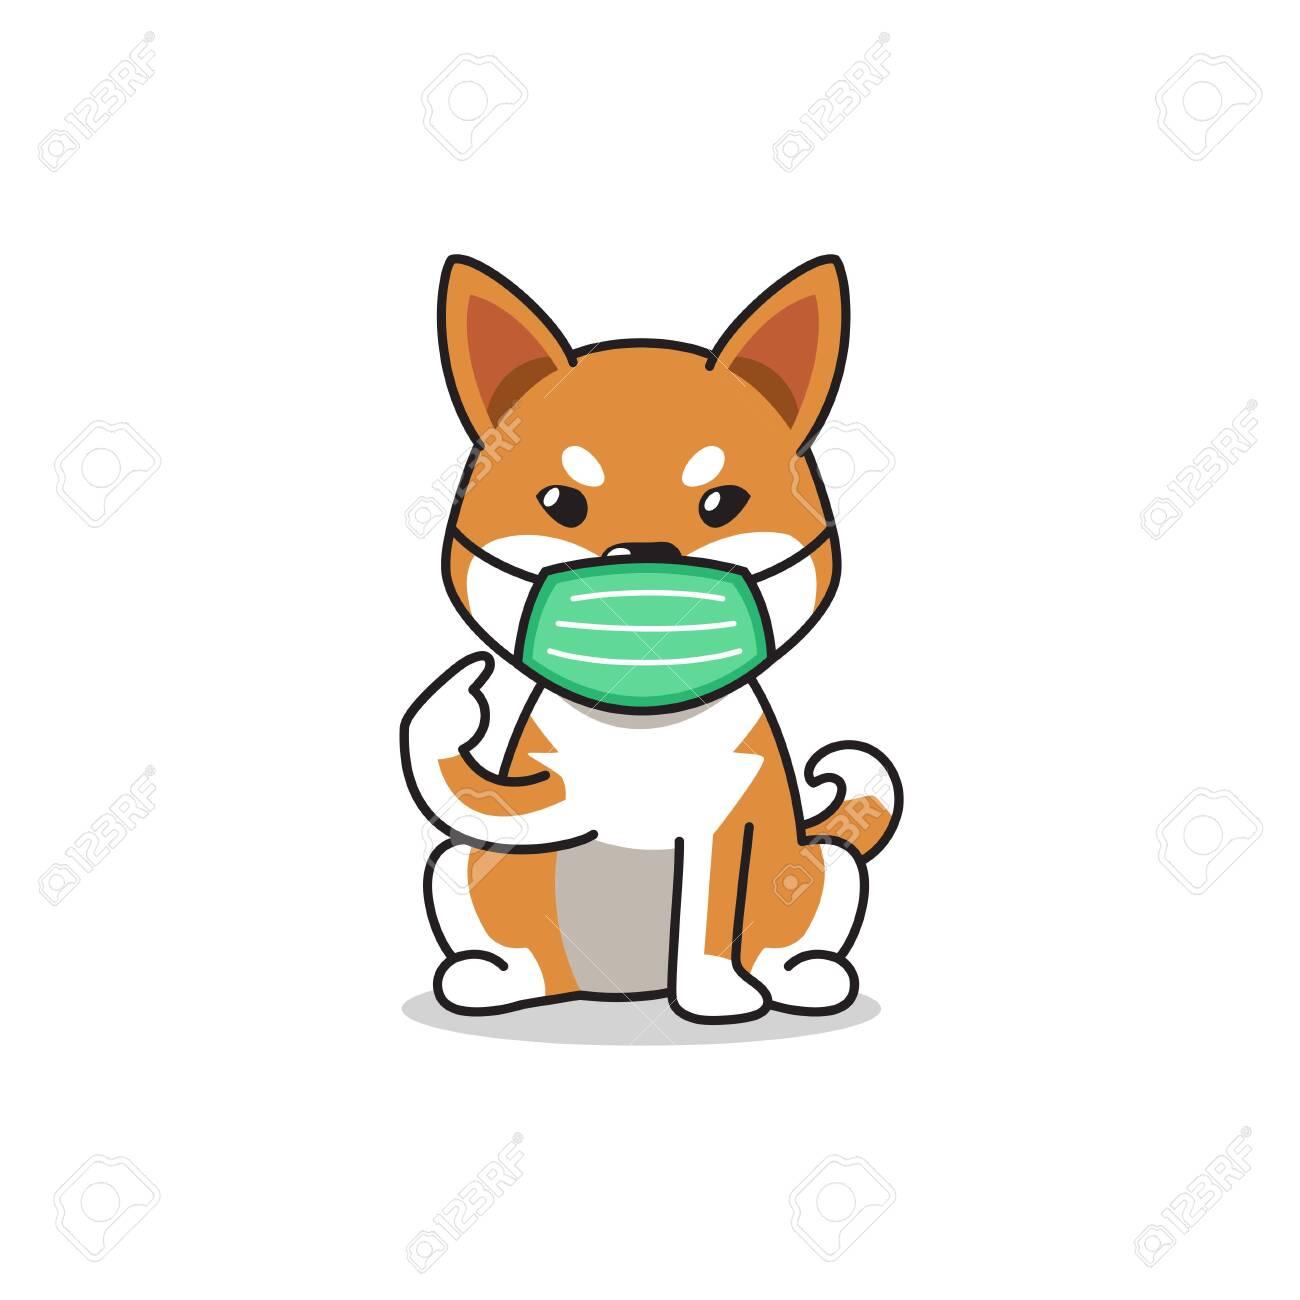 Cartoon Character Shiba Inu Dog Wearing Protective Face Mask